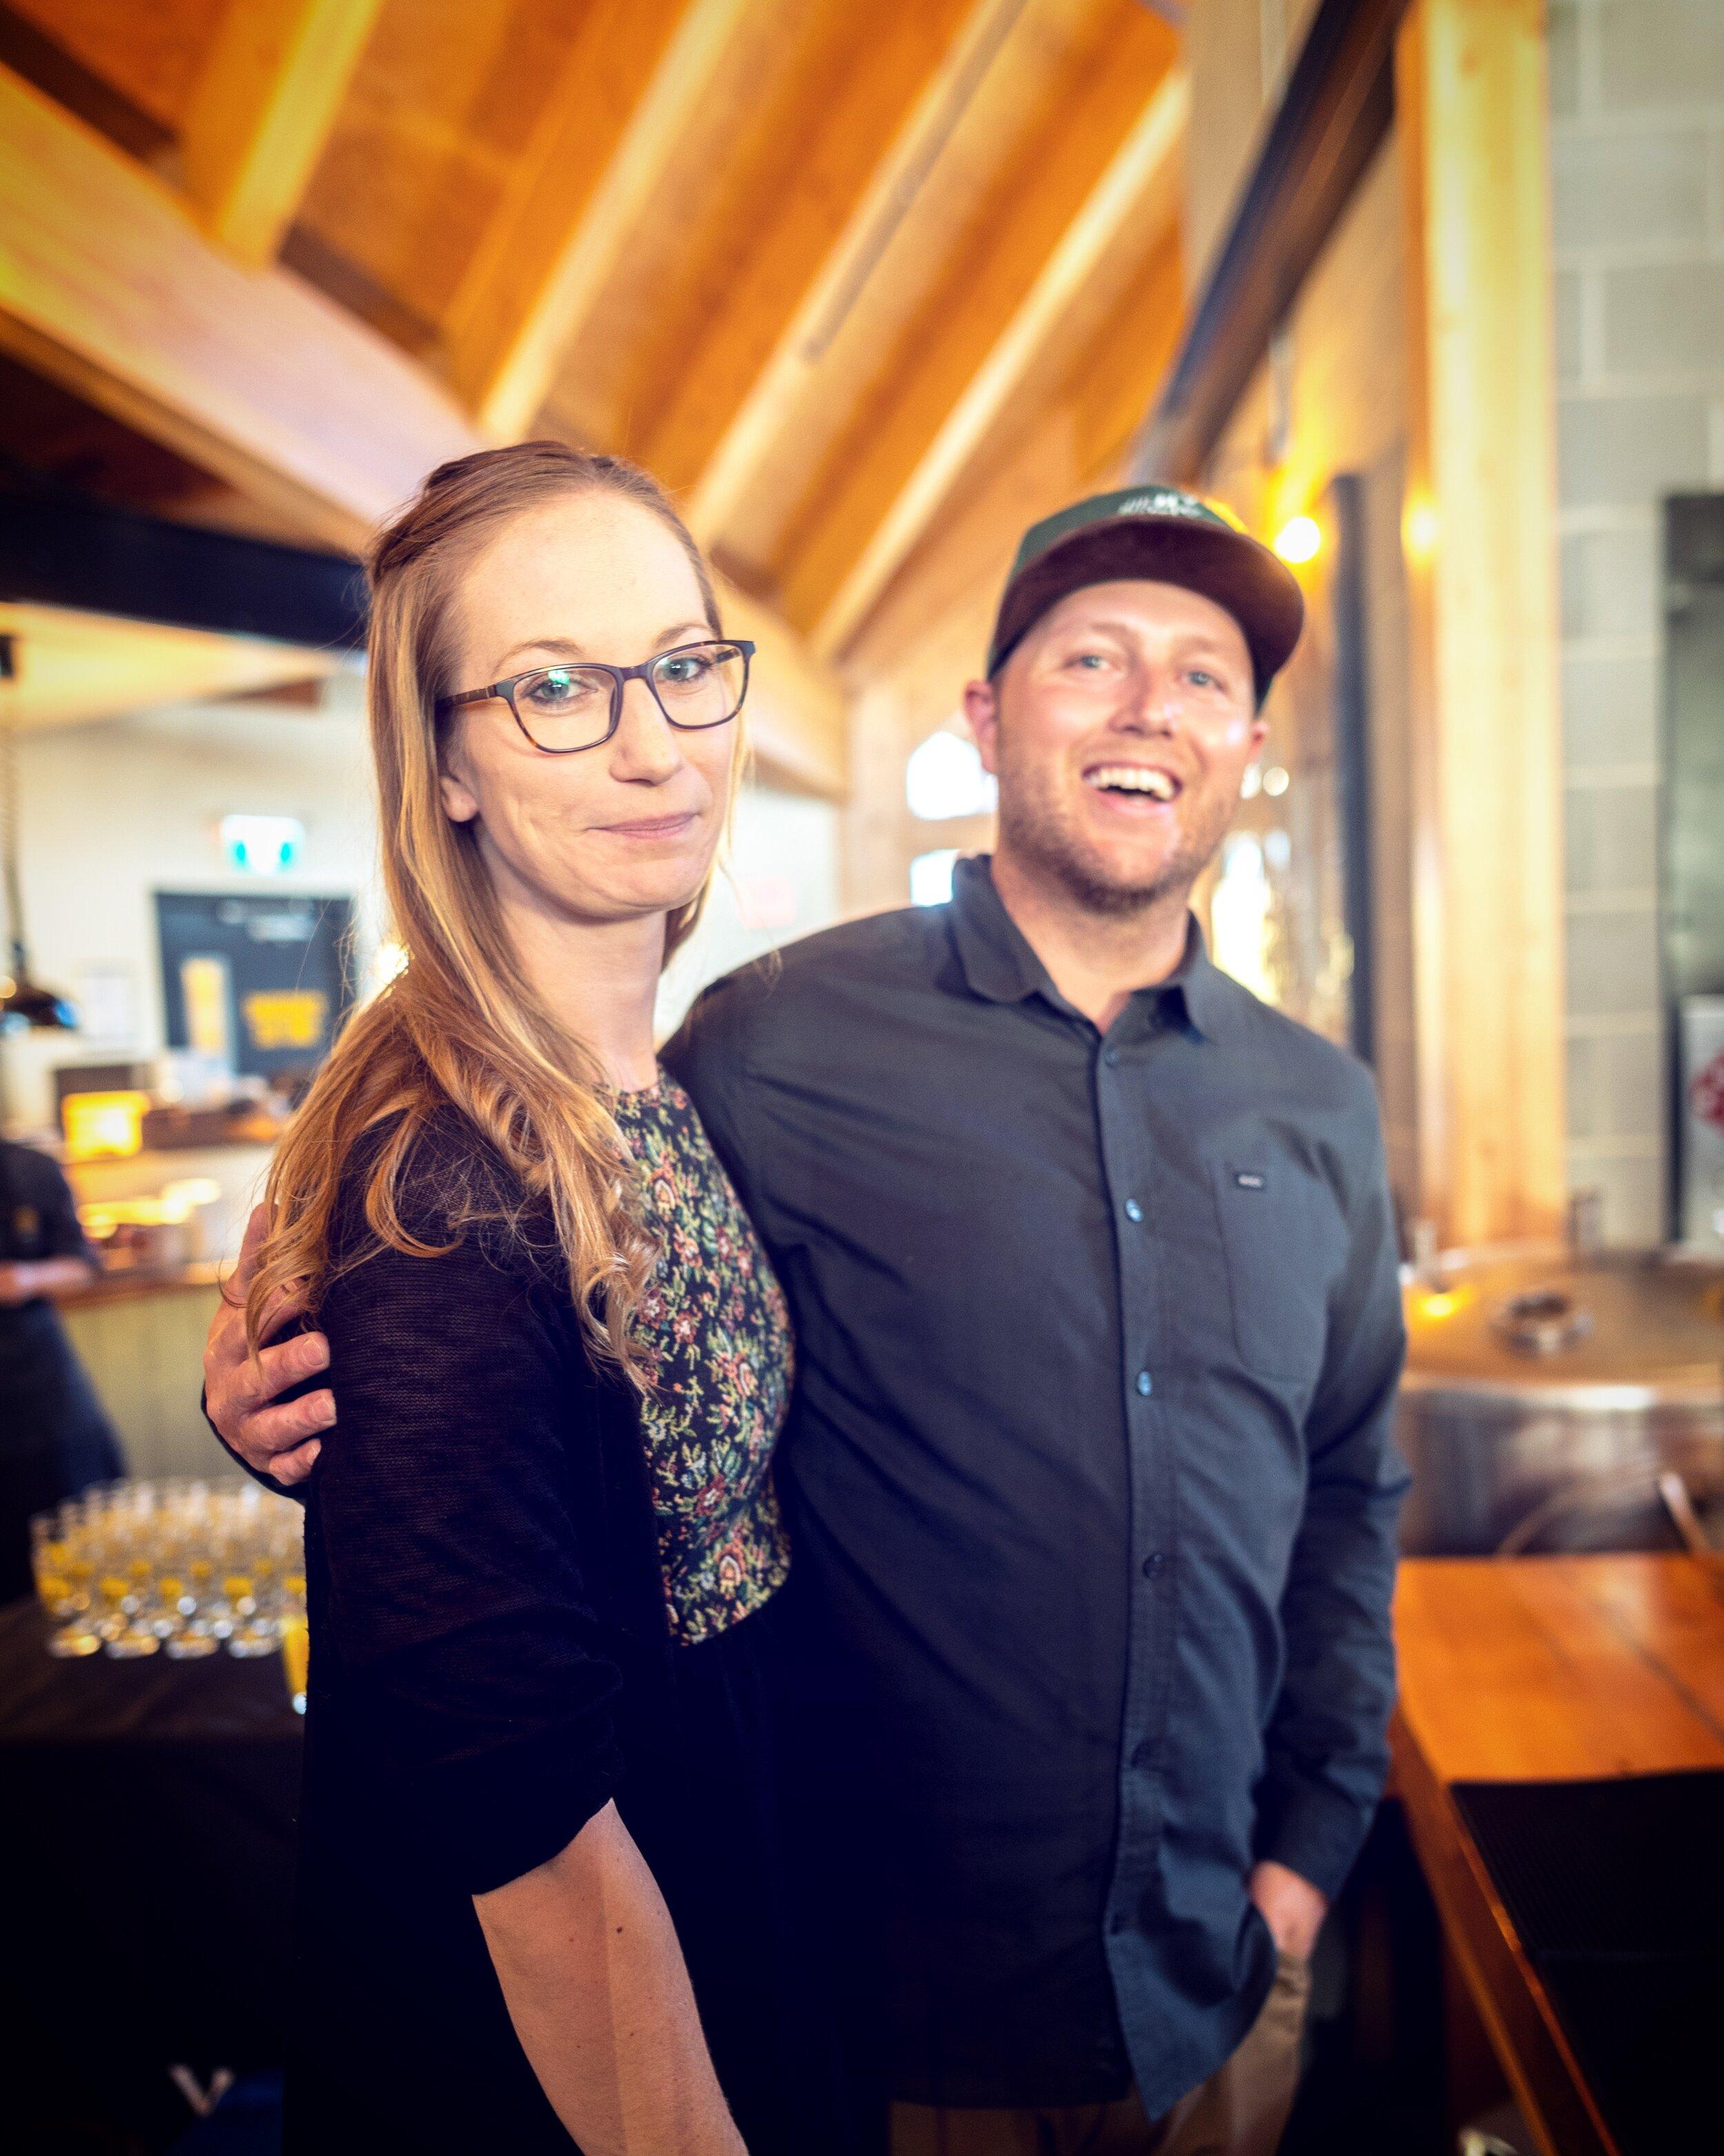 The cute couple. Ms. Cheryl and Mr. Mark (our head distiller).